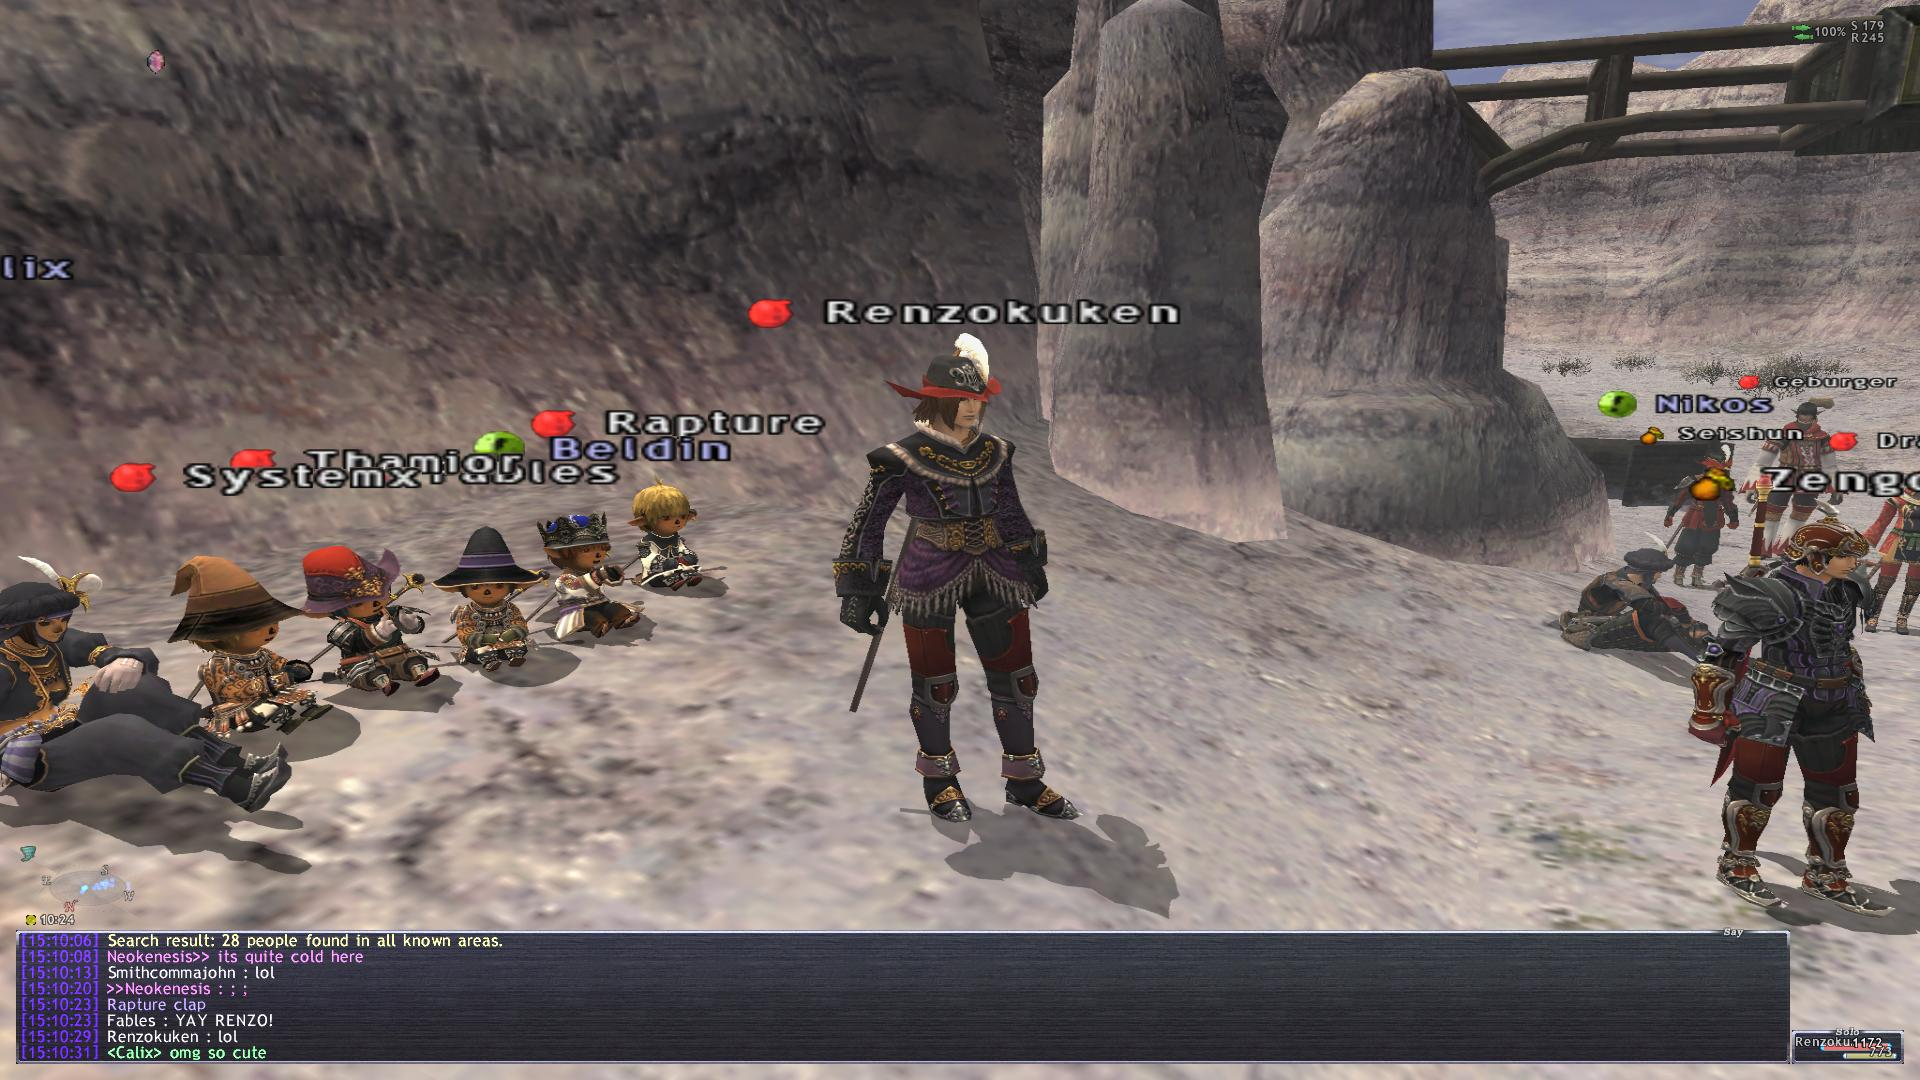 renzokuken general nsfw random image ragns anger xxxivwhats suggest click foxnews reason spiders tattoo xxxiii thread fucking moose spoilers owns forum accounts